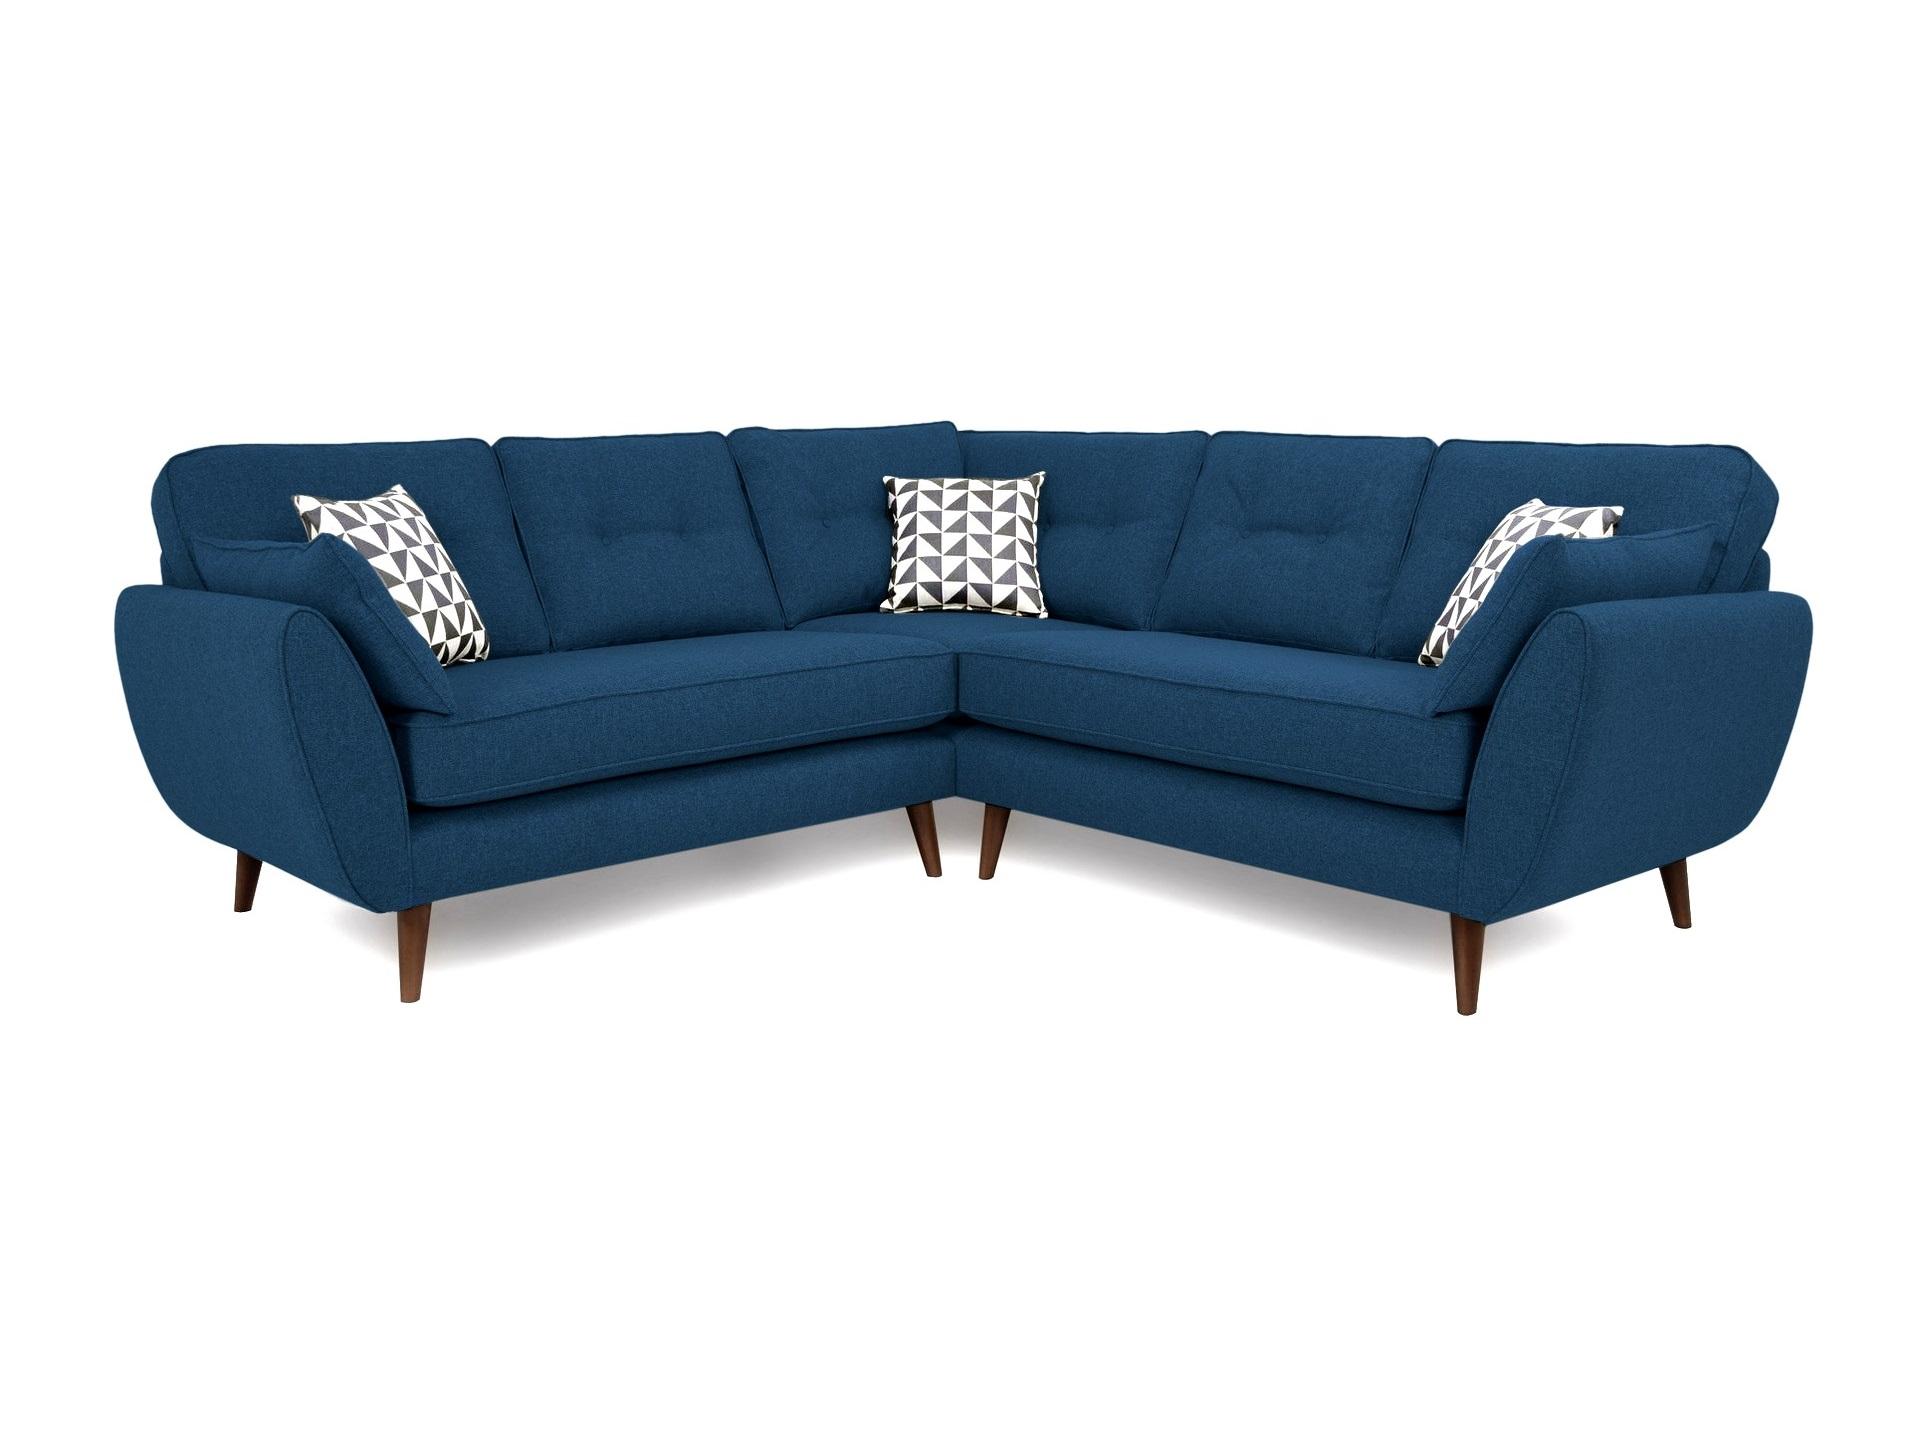 Myfurnish угловой диван vogue full синий  71083/7